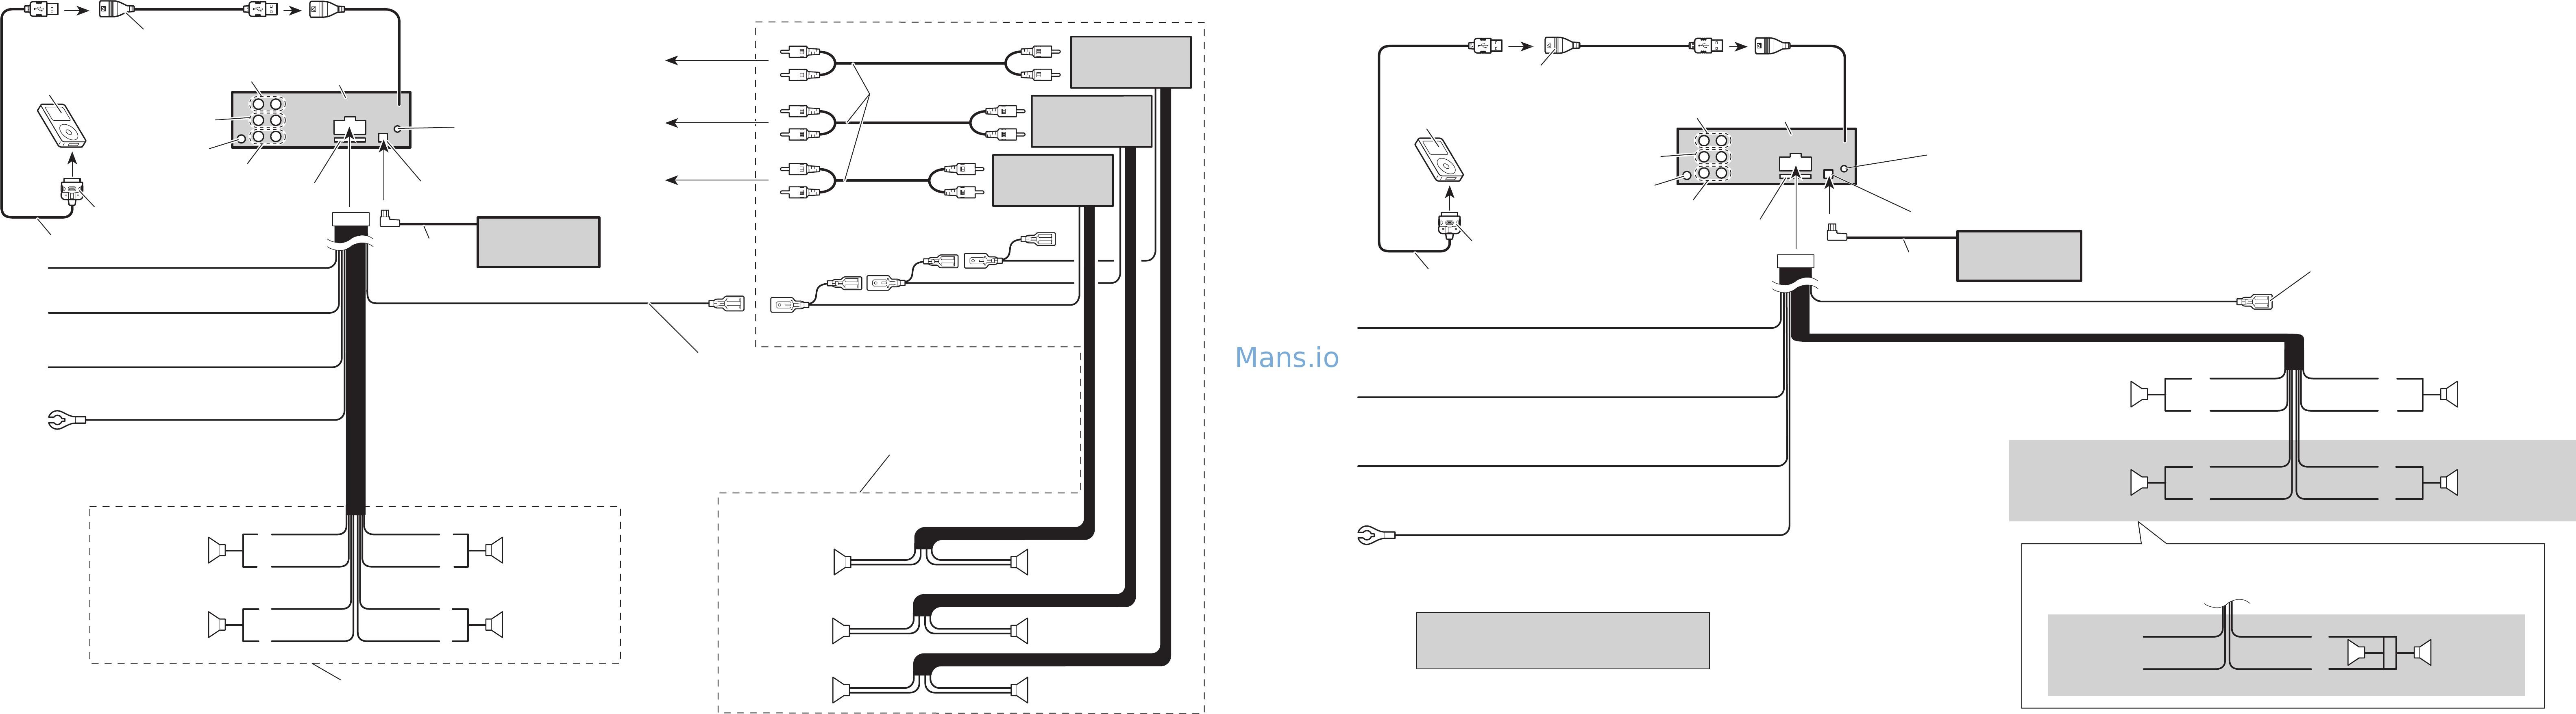 Pioneer Deh-17 Wiring Diagram Pioneer Deh P410ub Installation Manual Page 3 Of Pioneer Deh-17 Wiring Diagram